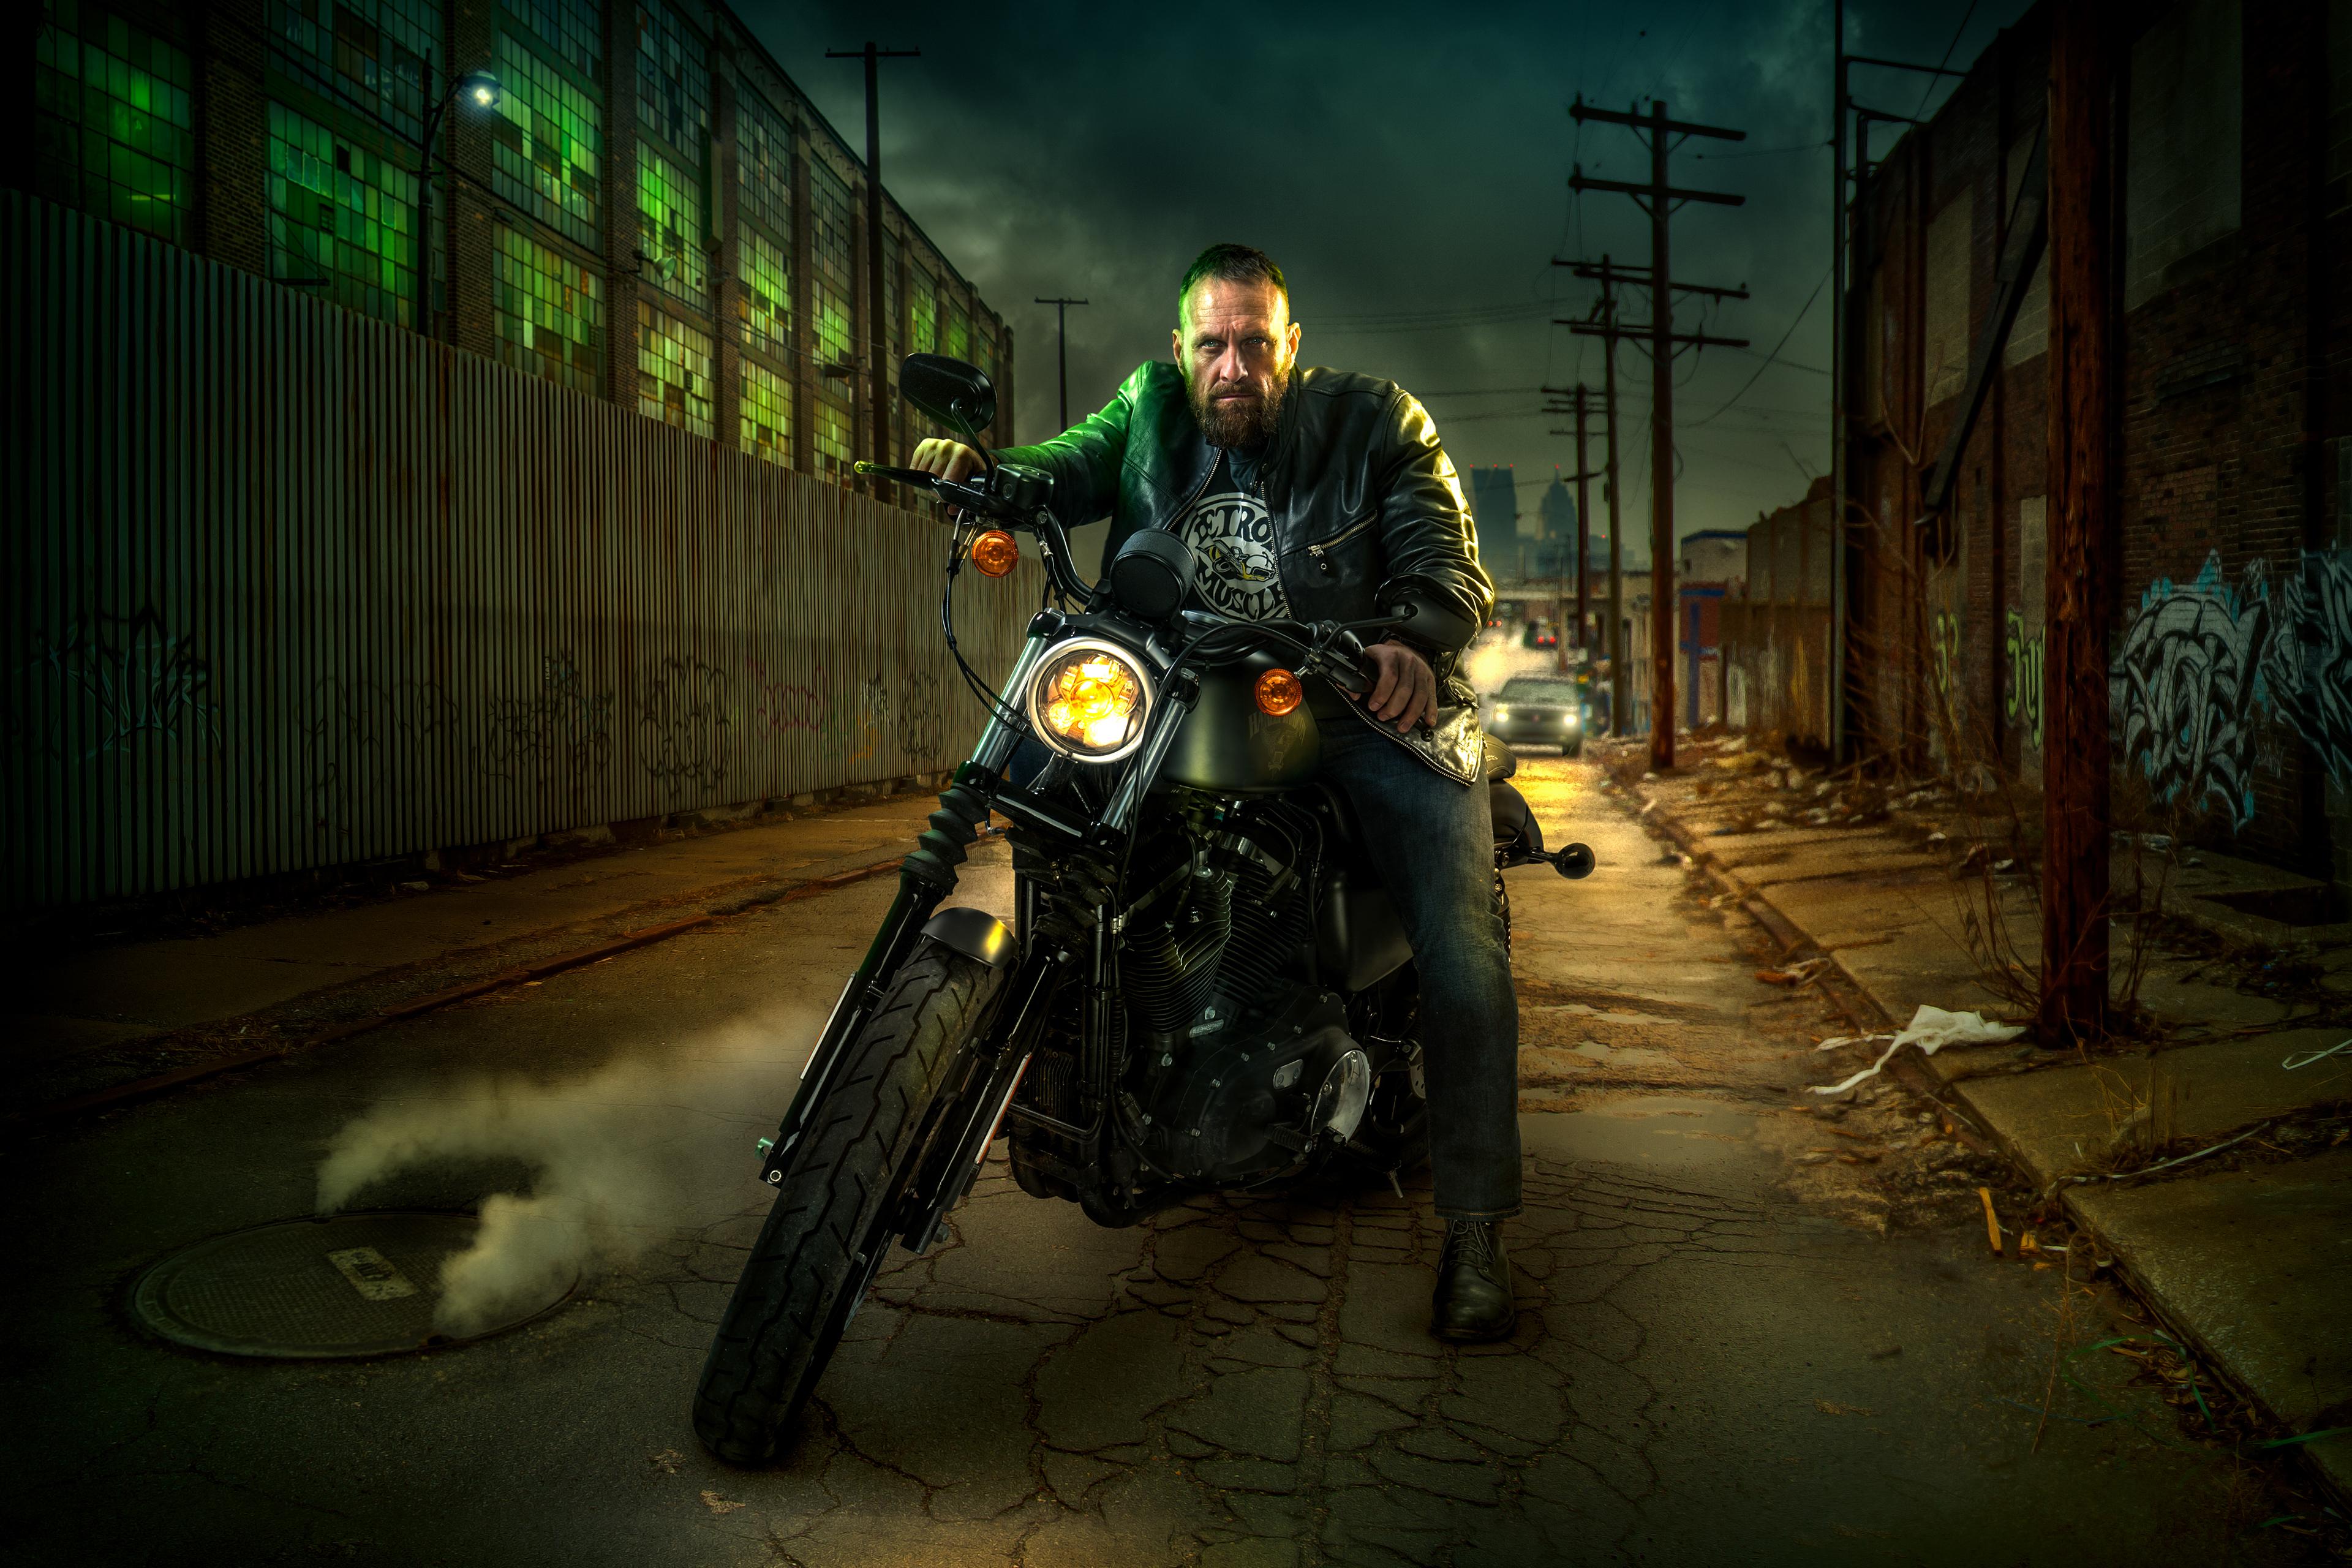 1080x1920 Harley Davidson Night Rider Iphone 7,6s,6 Plus